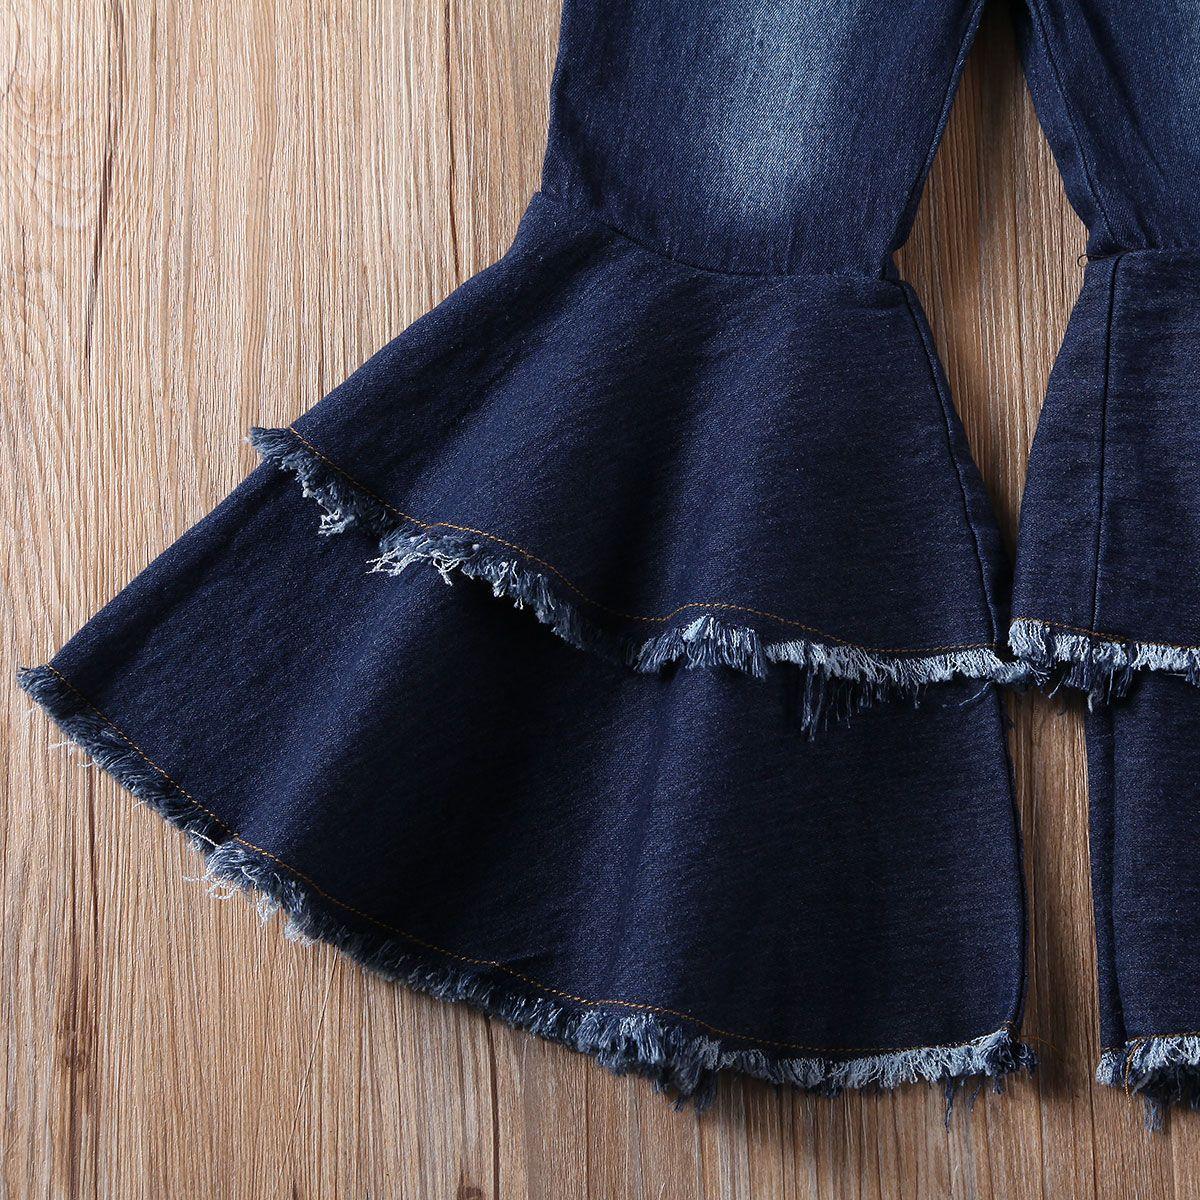 Bebek Bebek Çocuk Kız Bell-Bottoms Pant Denim Yüksek Bel Geniş Bacak Jeans Pantolon Pantolon 2-7Y